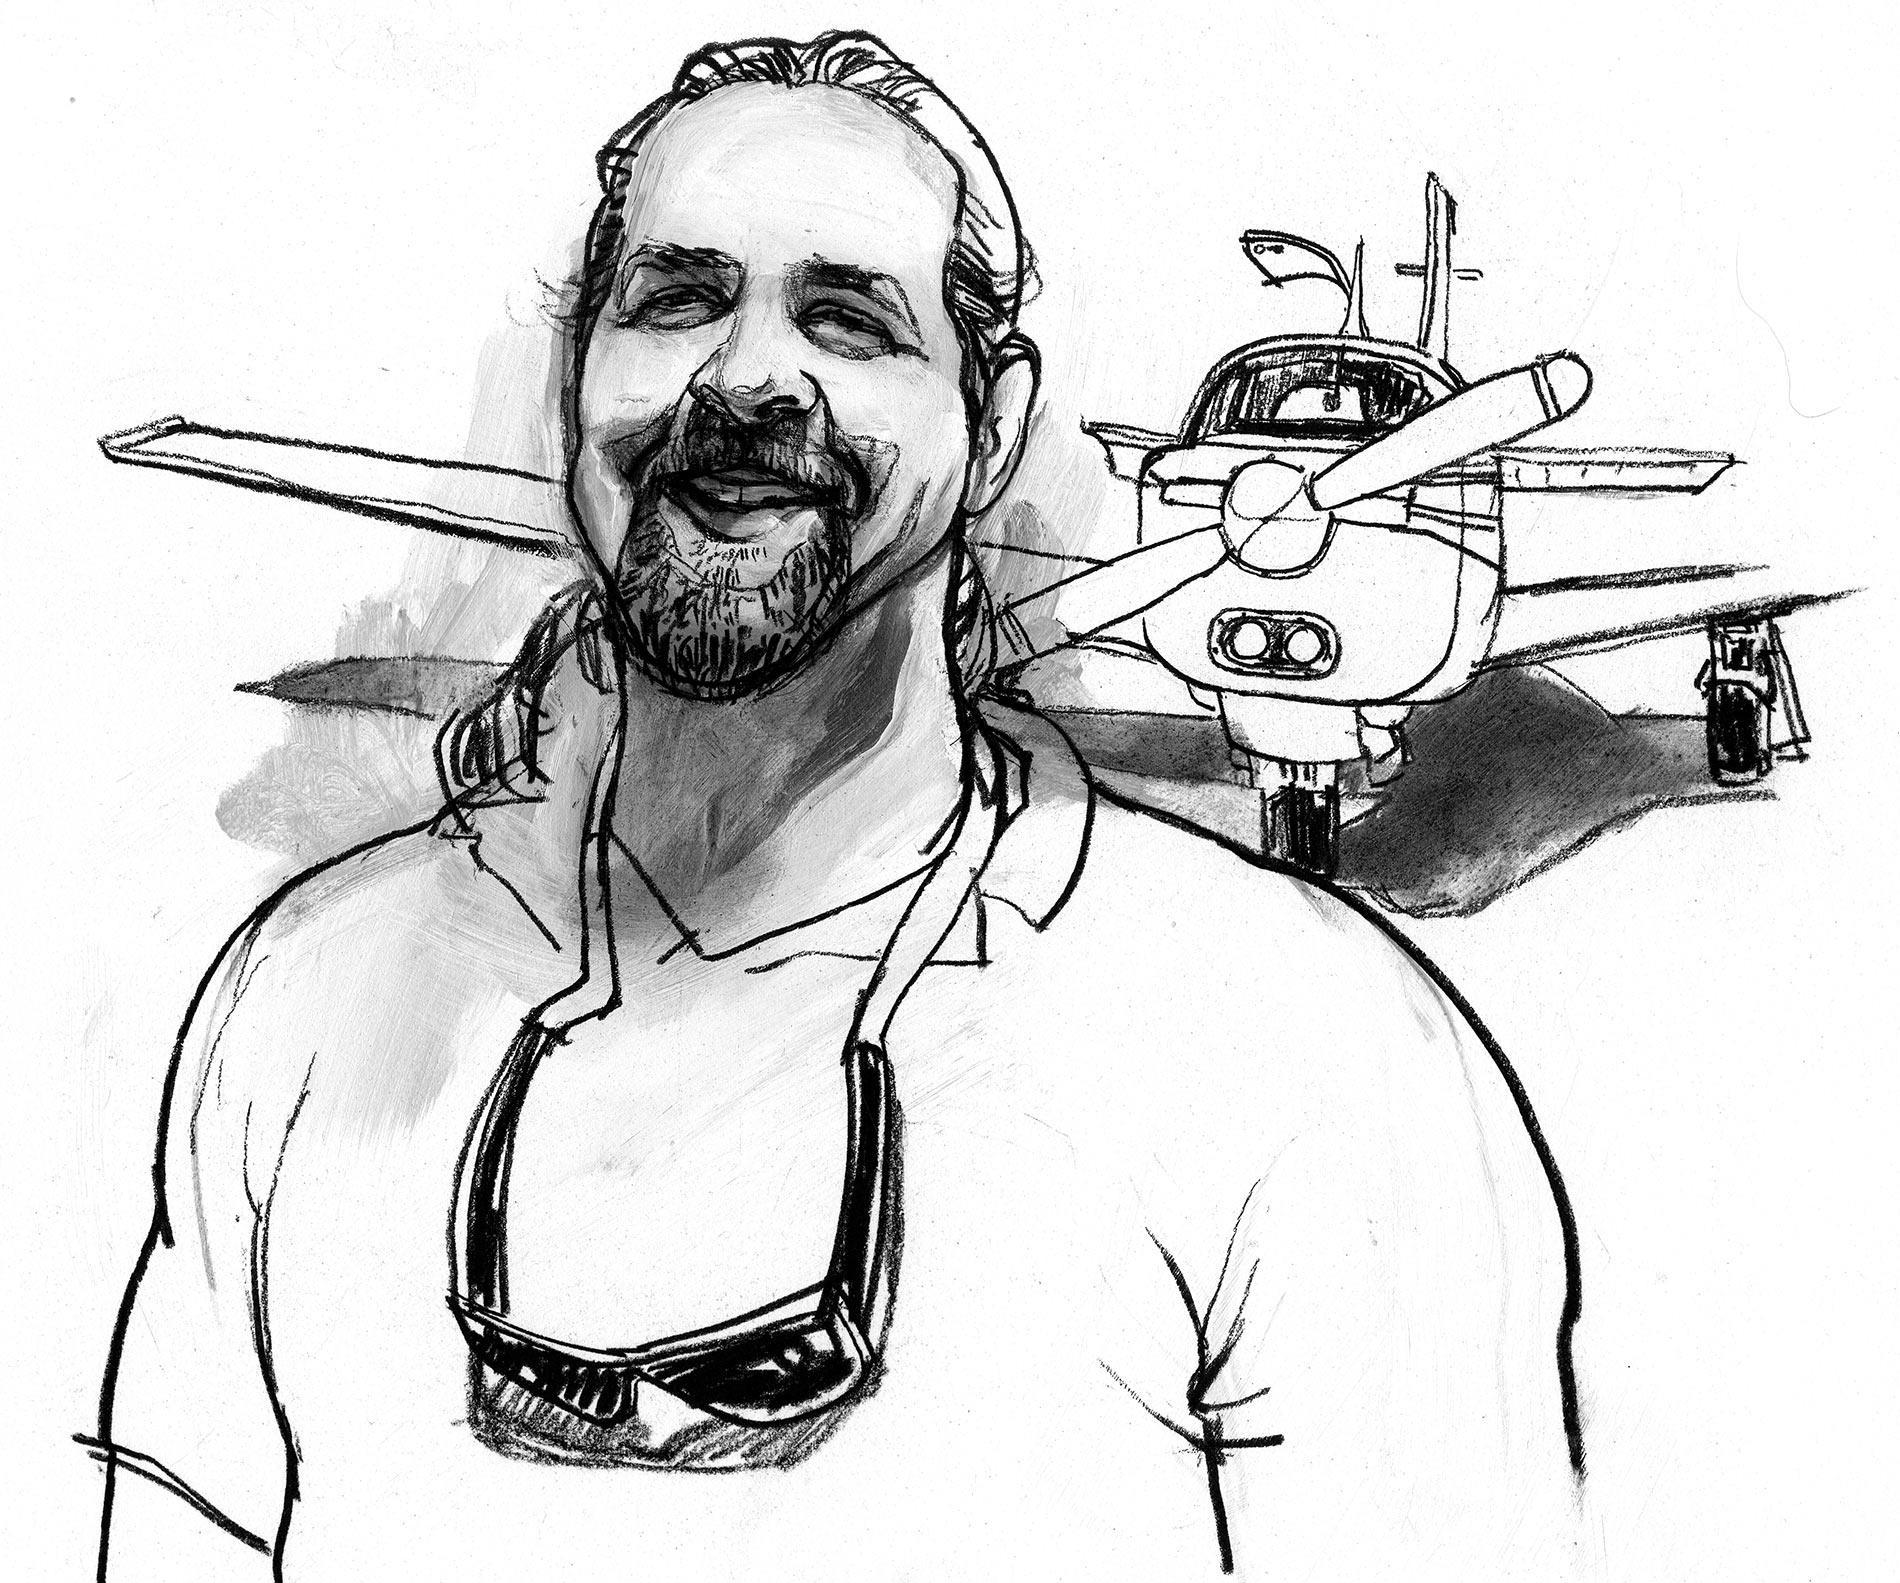 Guy-with-plane1.jpg